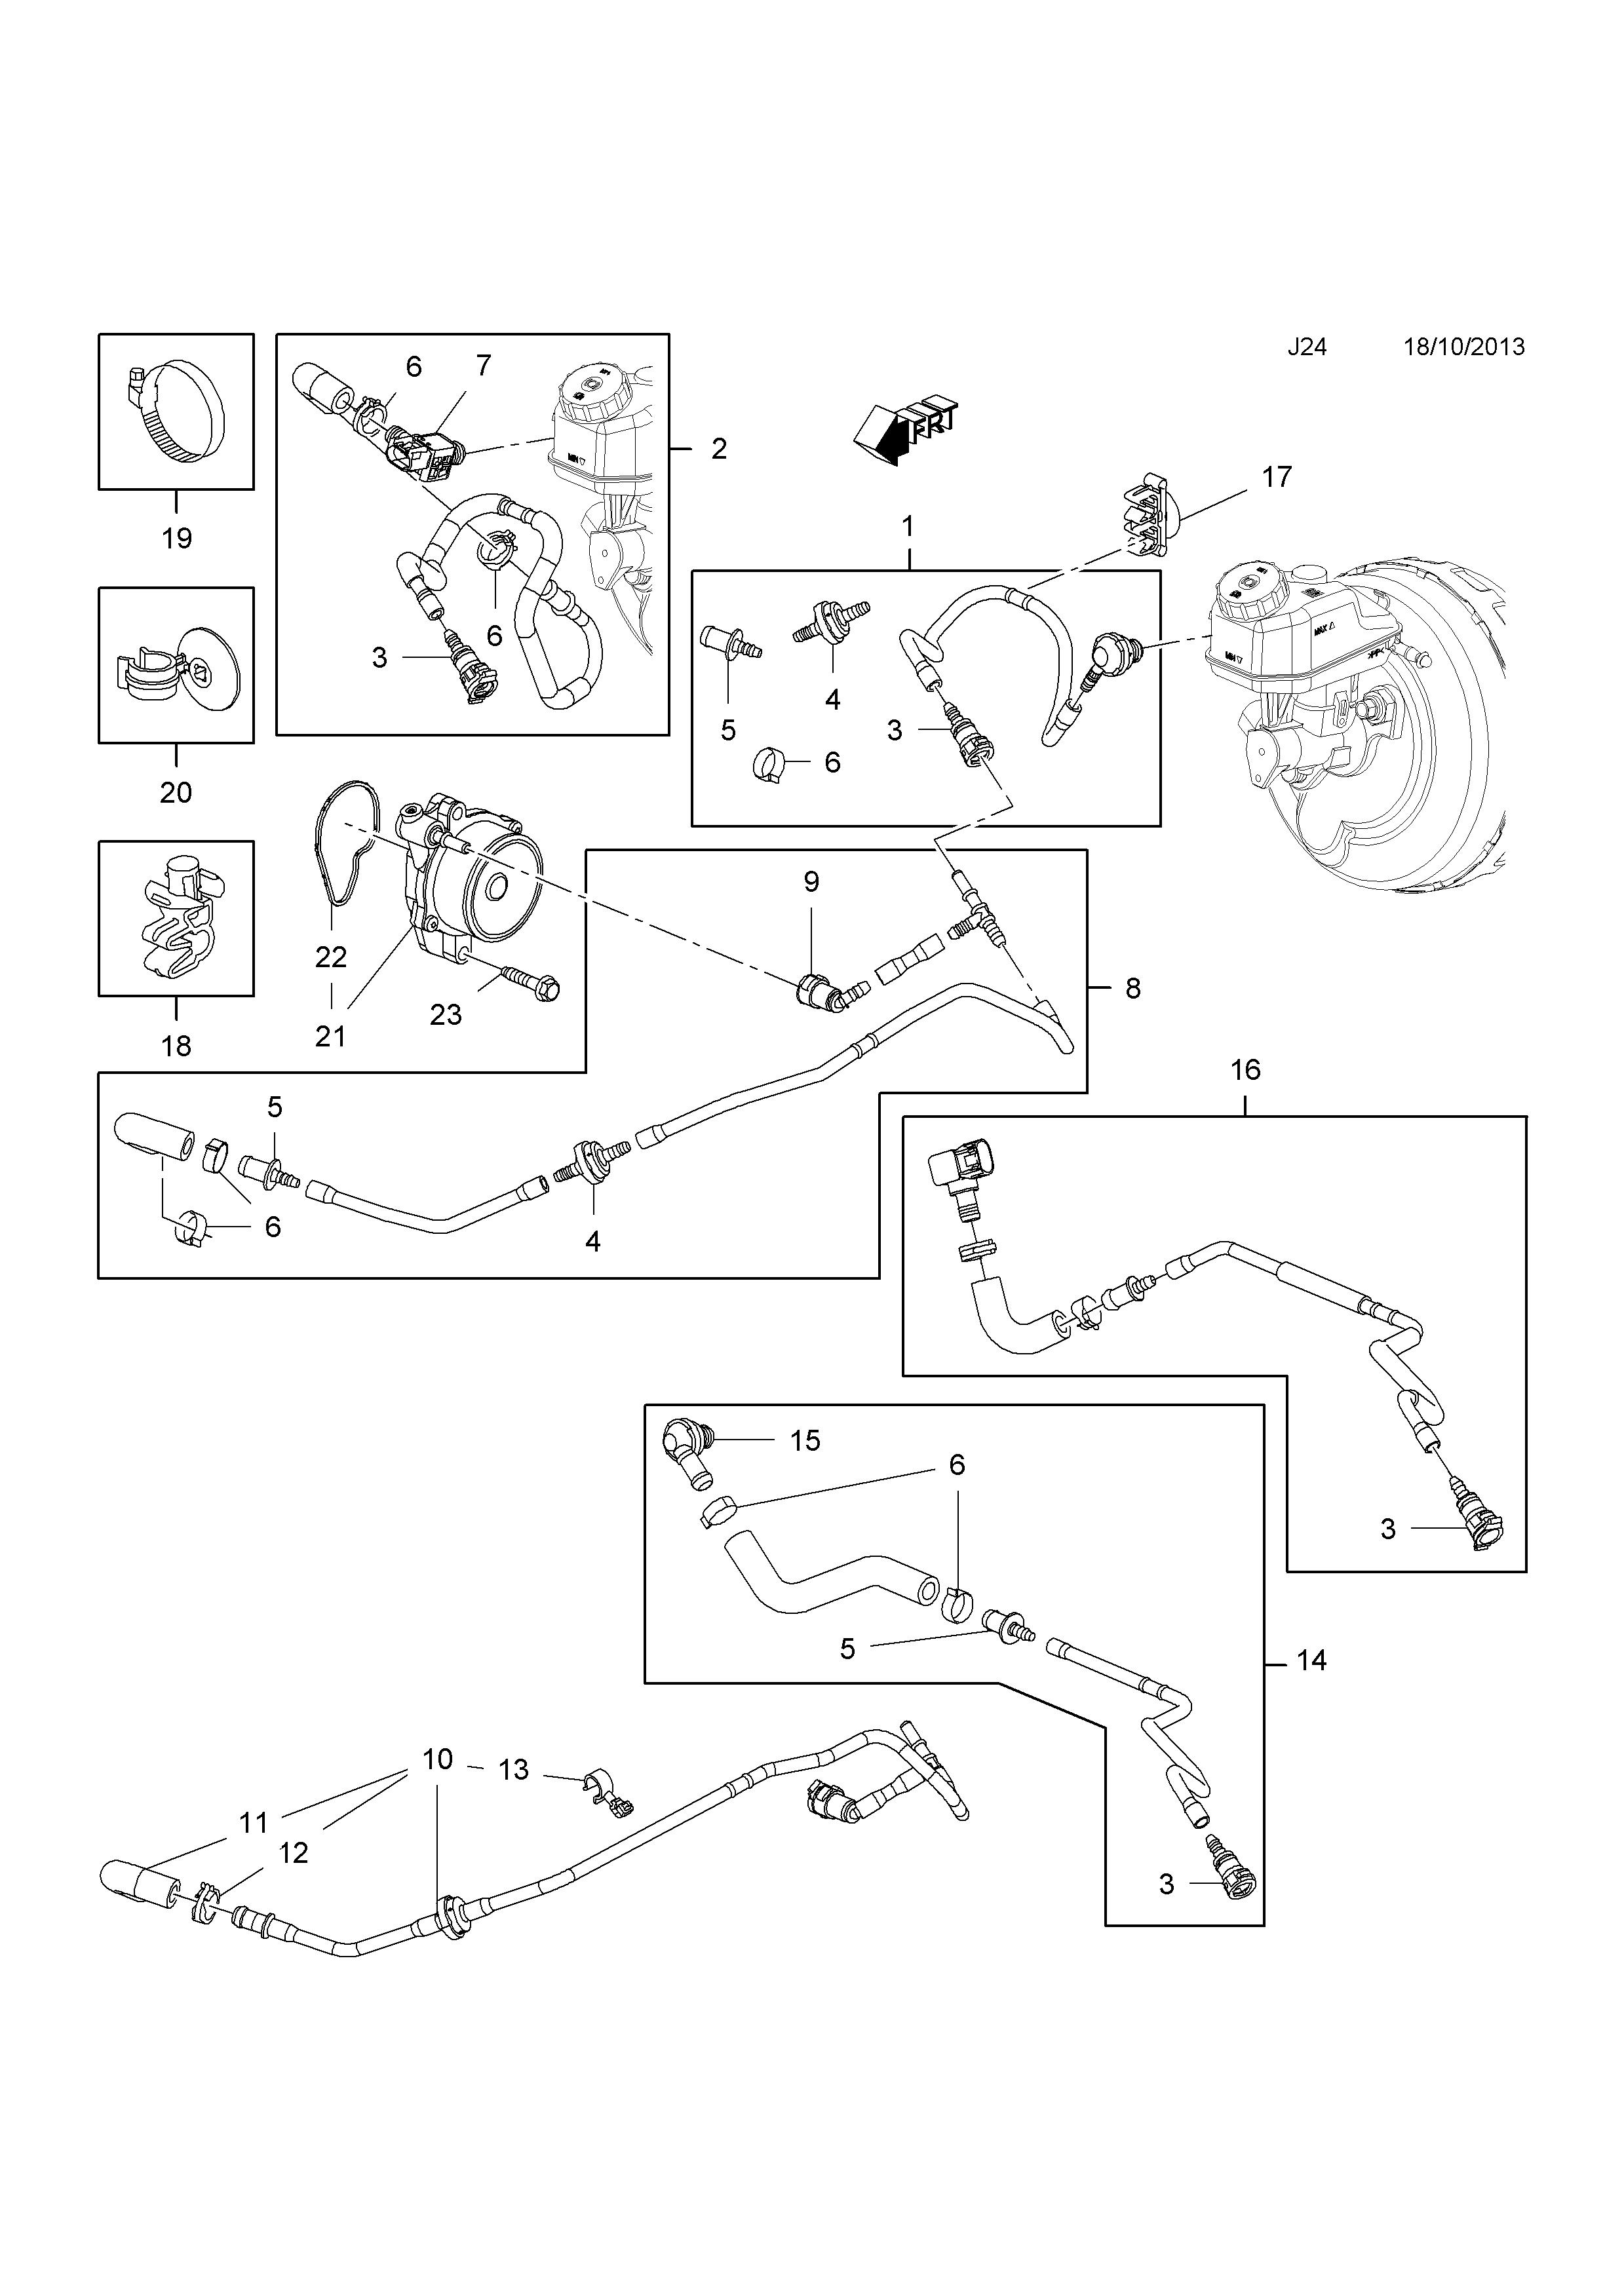 Tremendous Vauxhall Vacuum Diagram Wiring Diagram Wiring Digital Resources Bletukbiperorg